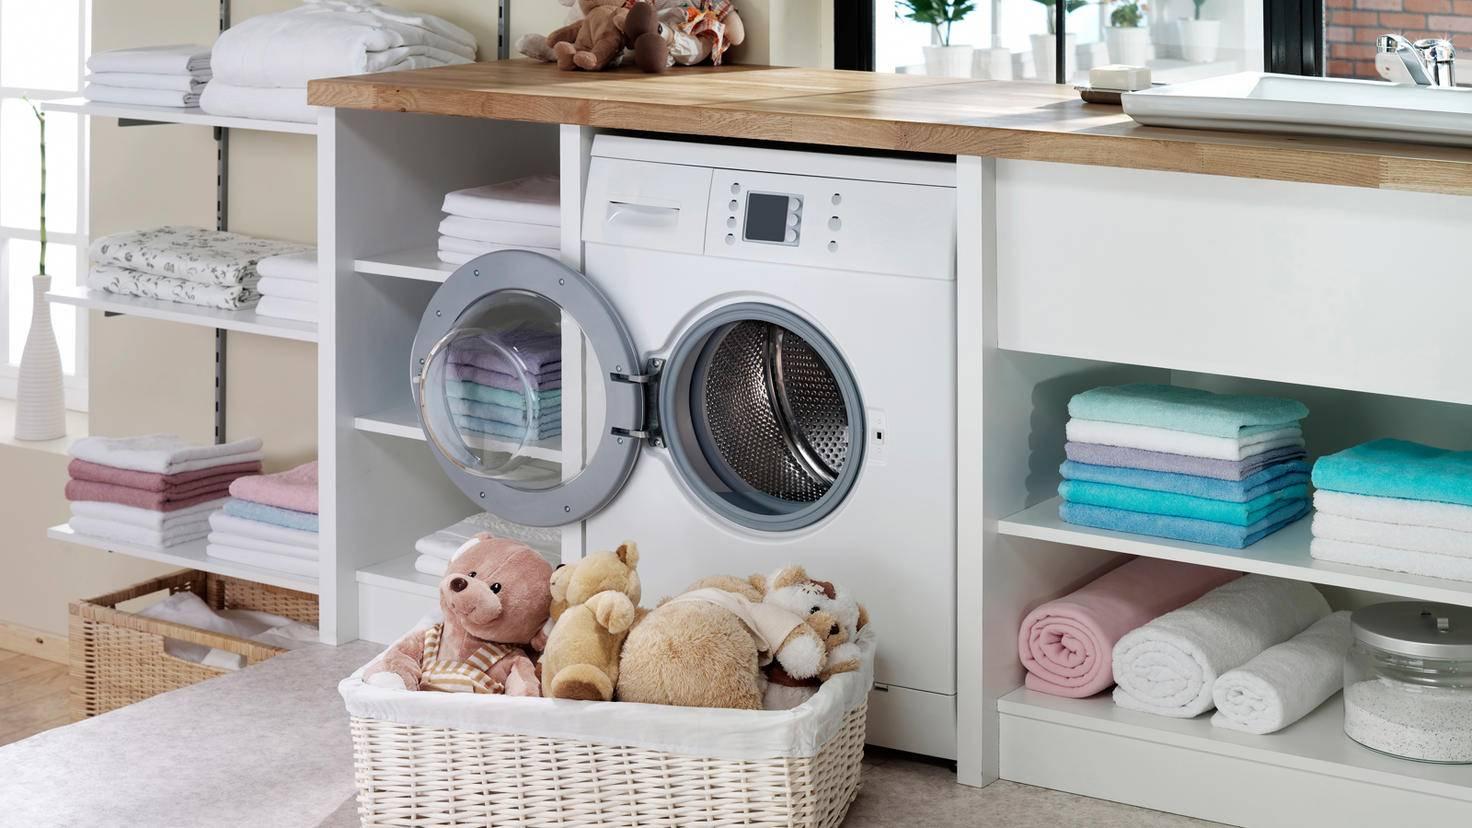 Washing-machine-door-open-cleaning-gerenme-GettyImages-471727557